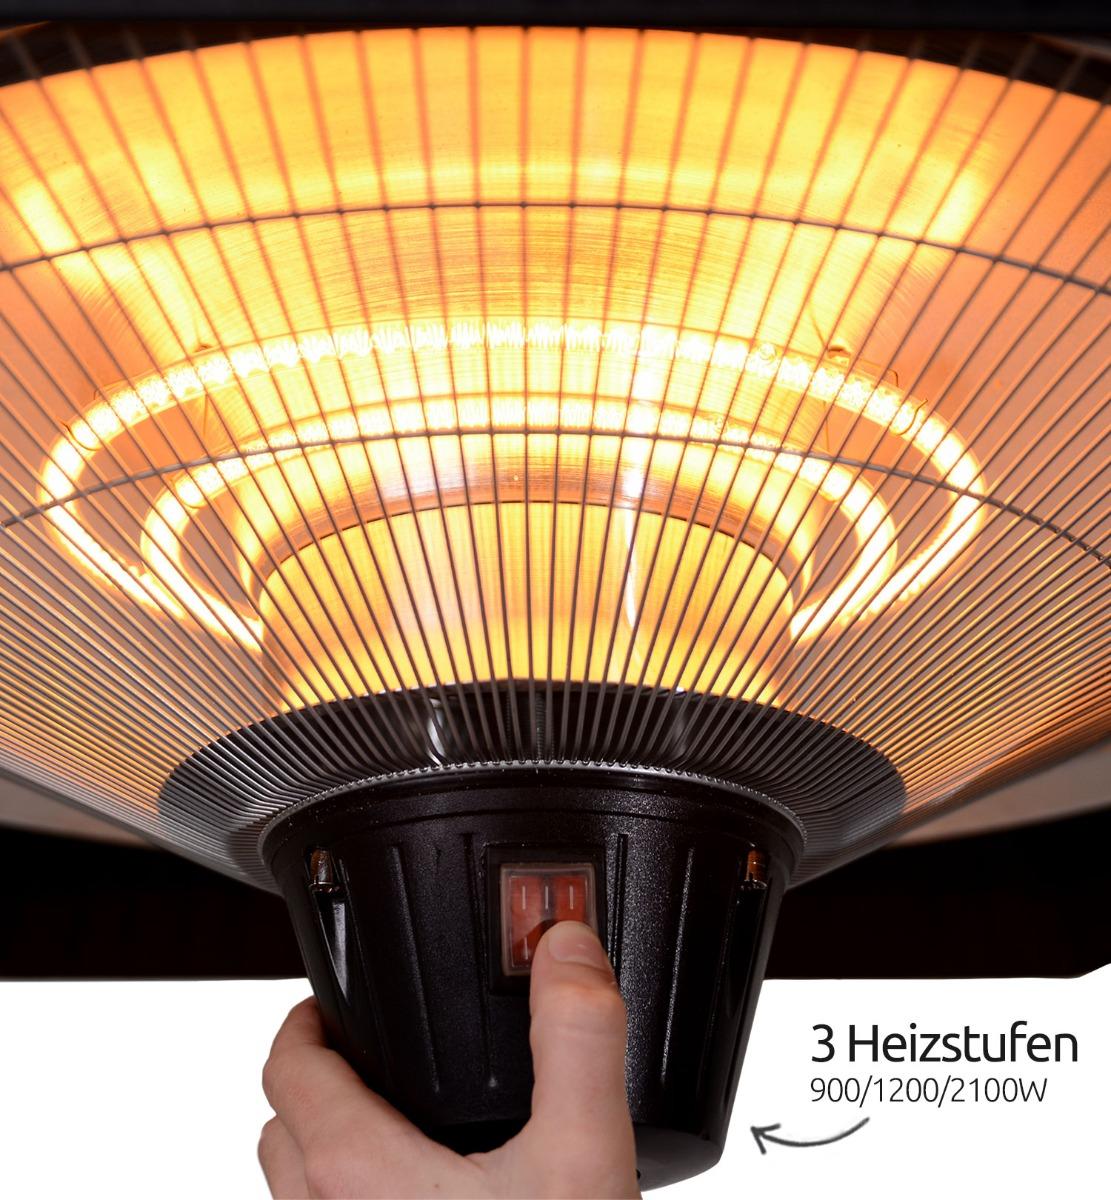 Infrarot Heizstrahler - Heizstufen